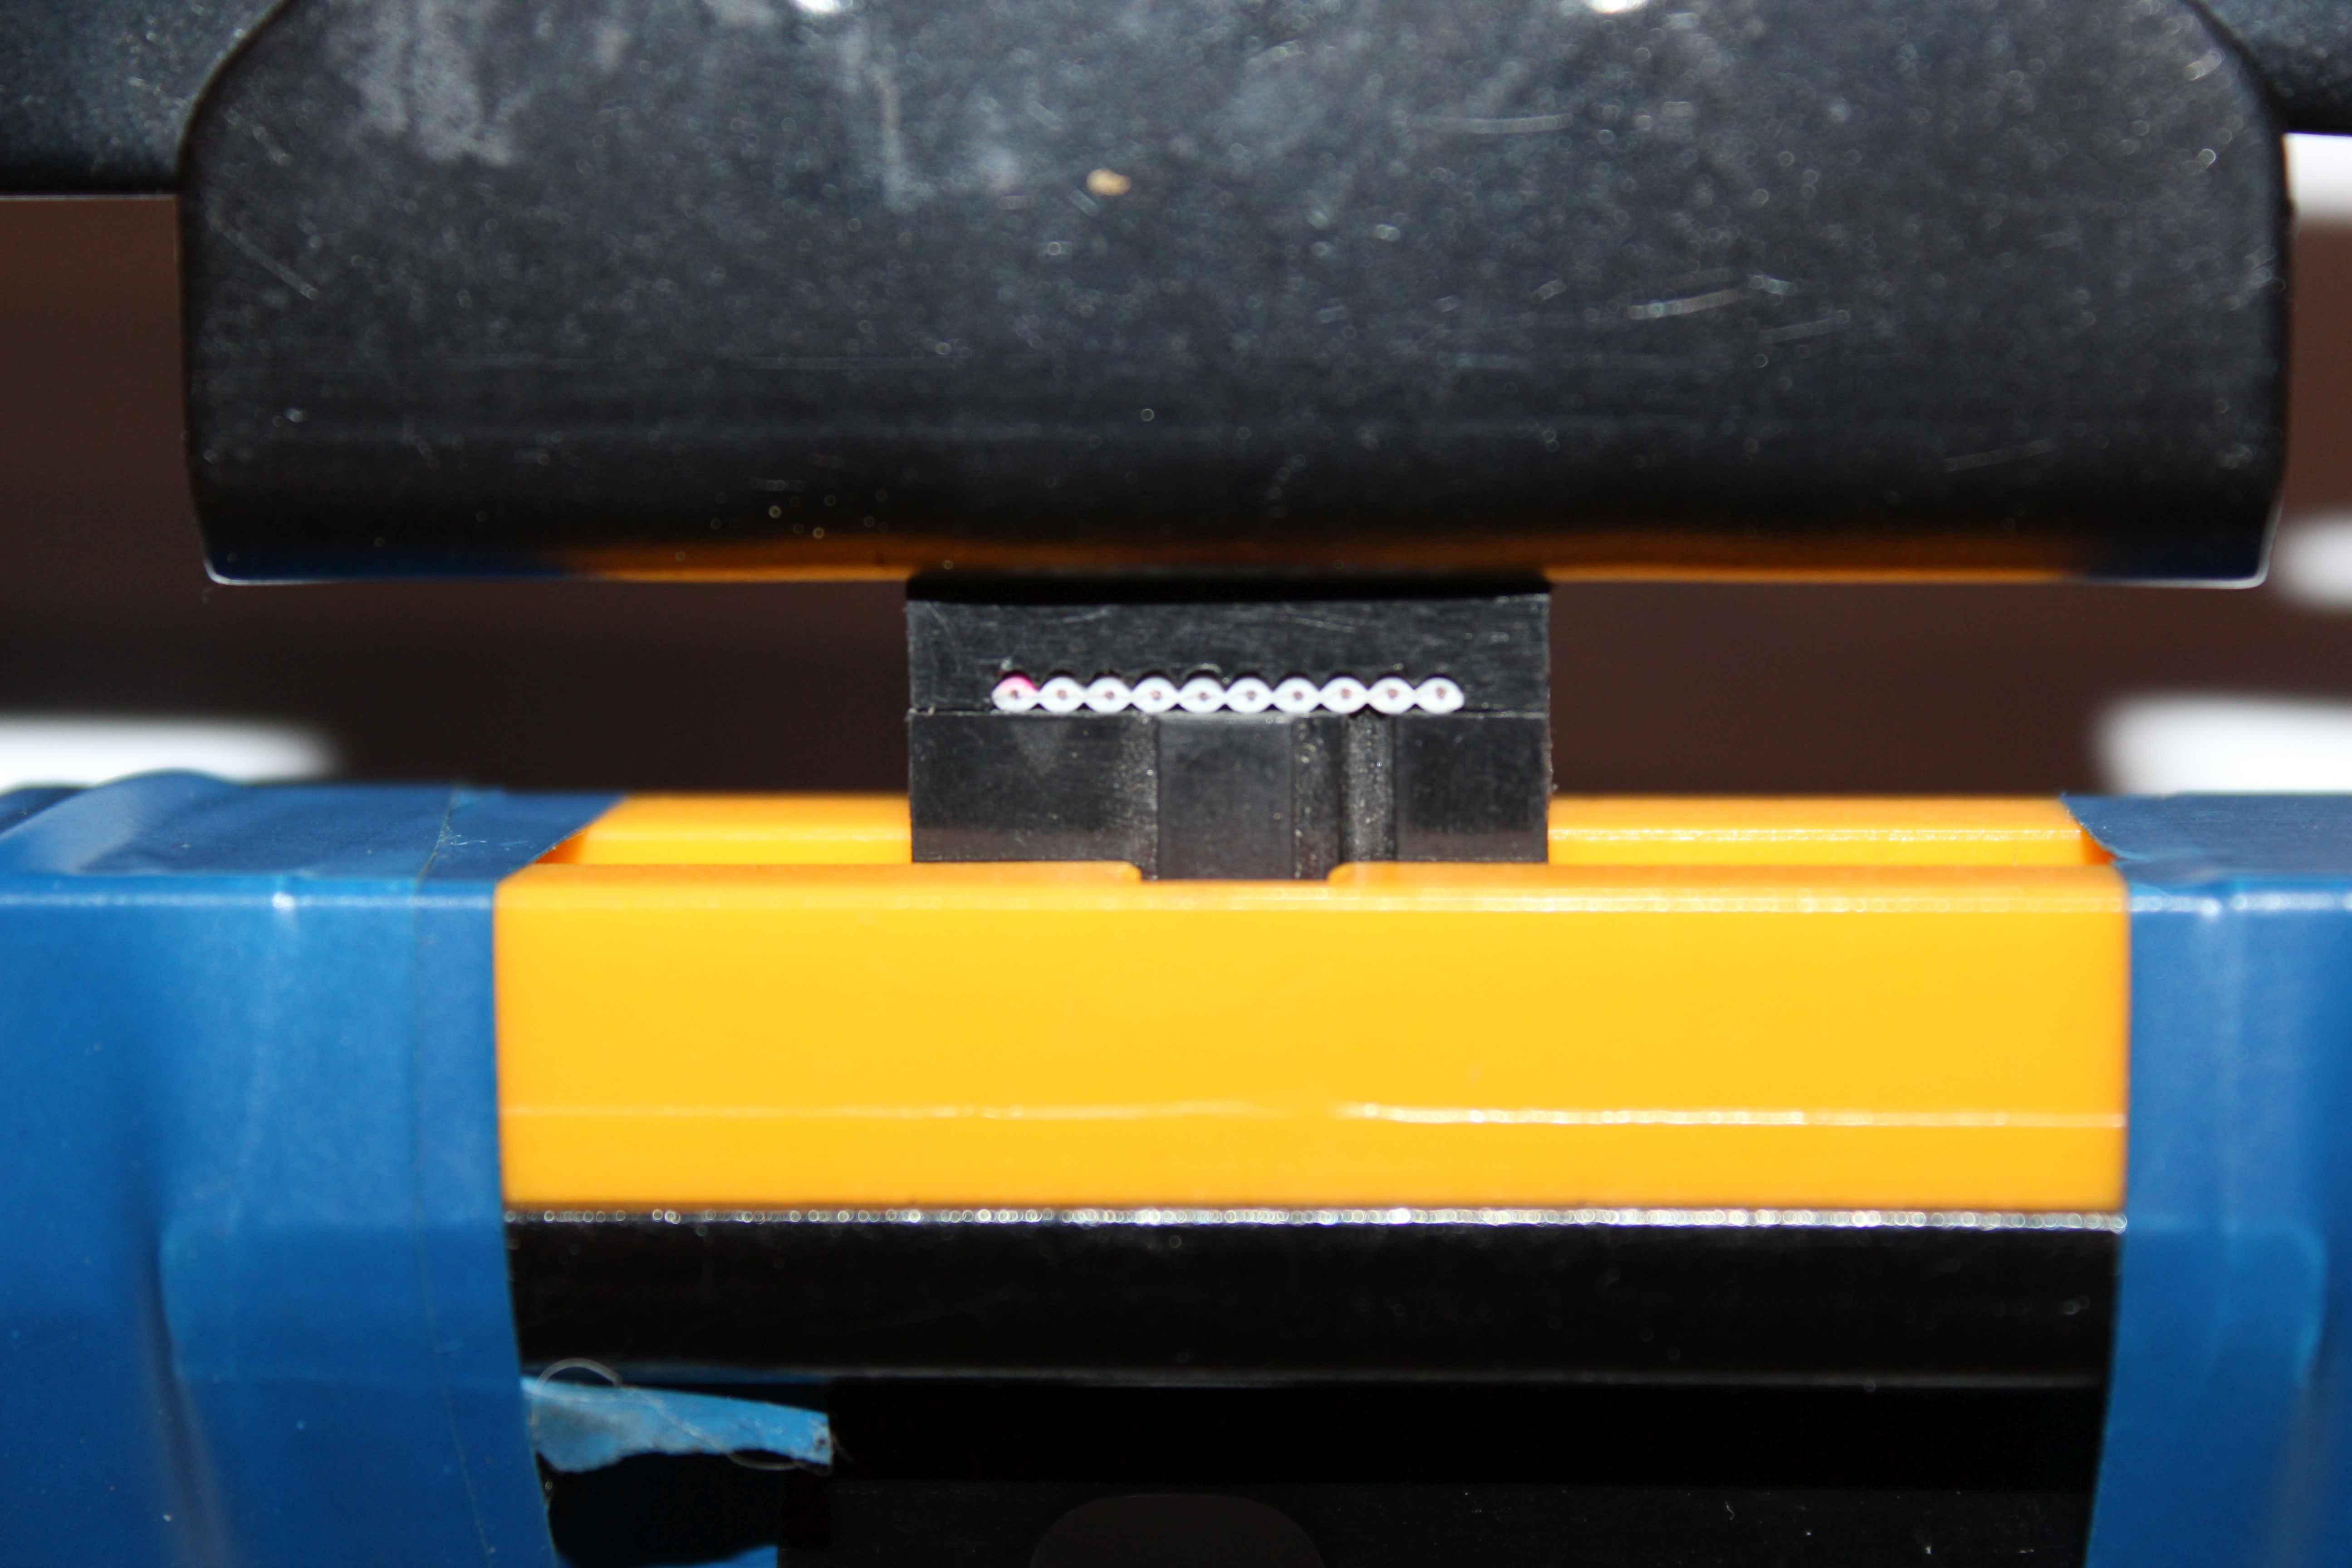 The tape flat 10 pin IDC crimping